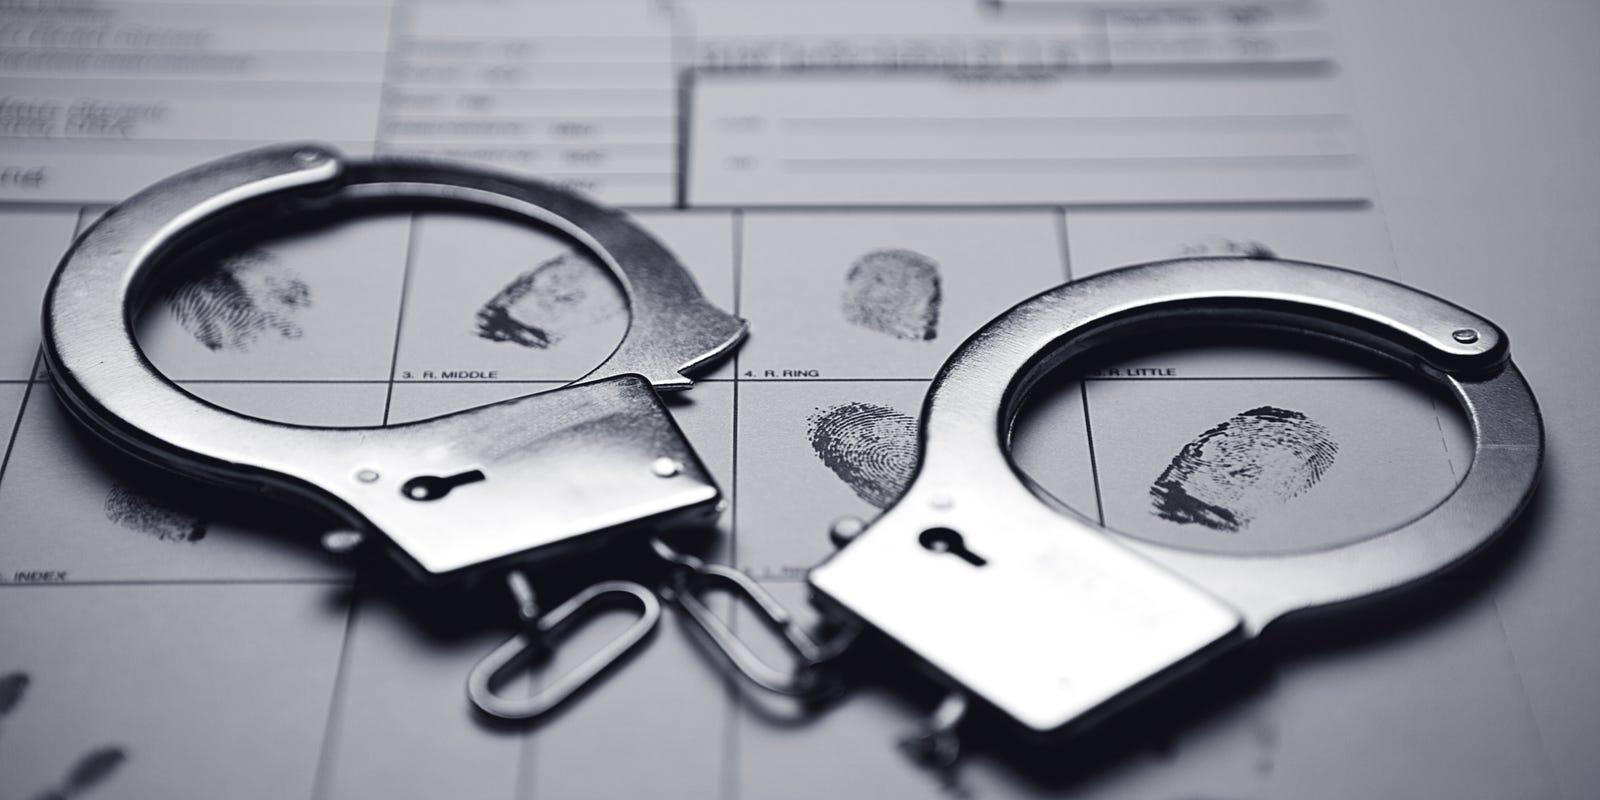 El Paso arrests tied to FBI prostitution operation